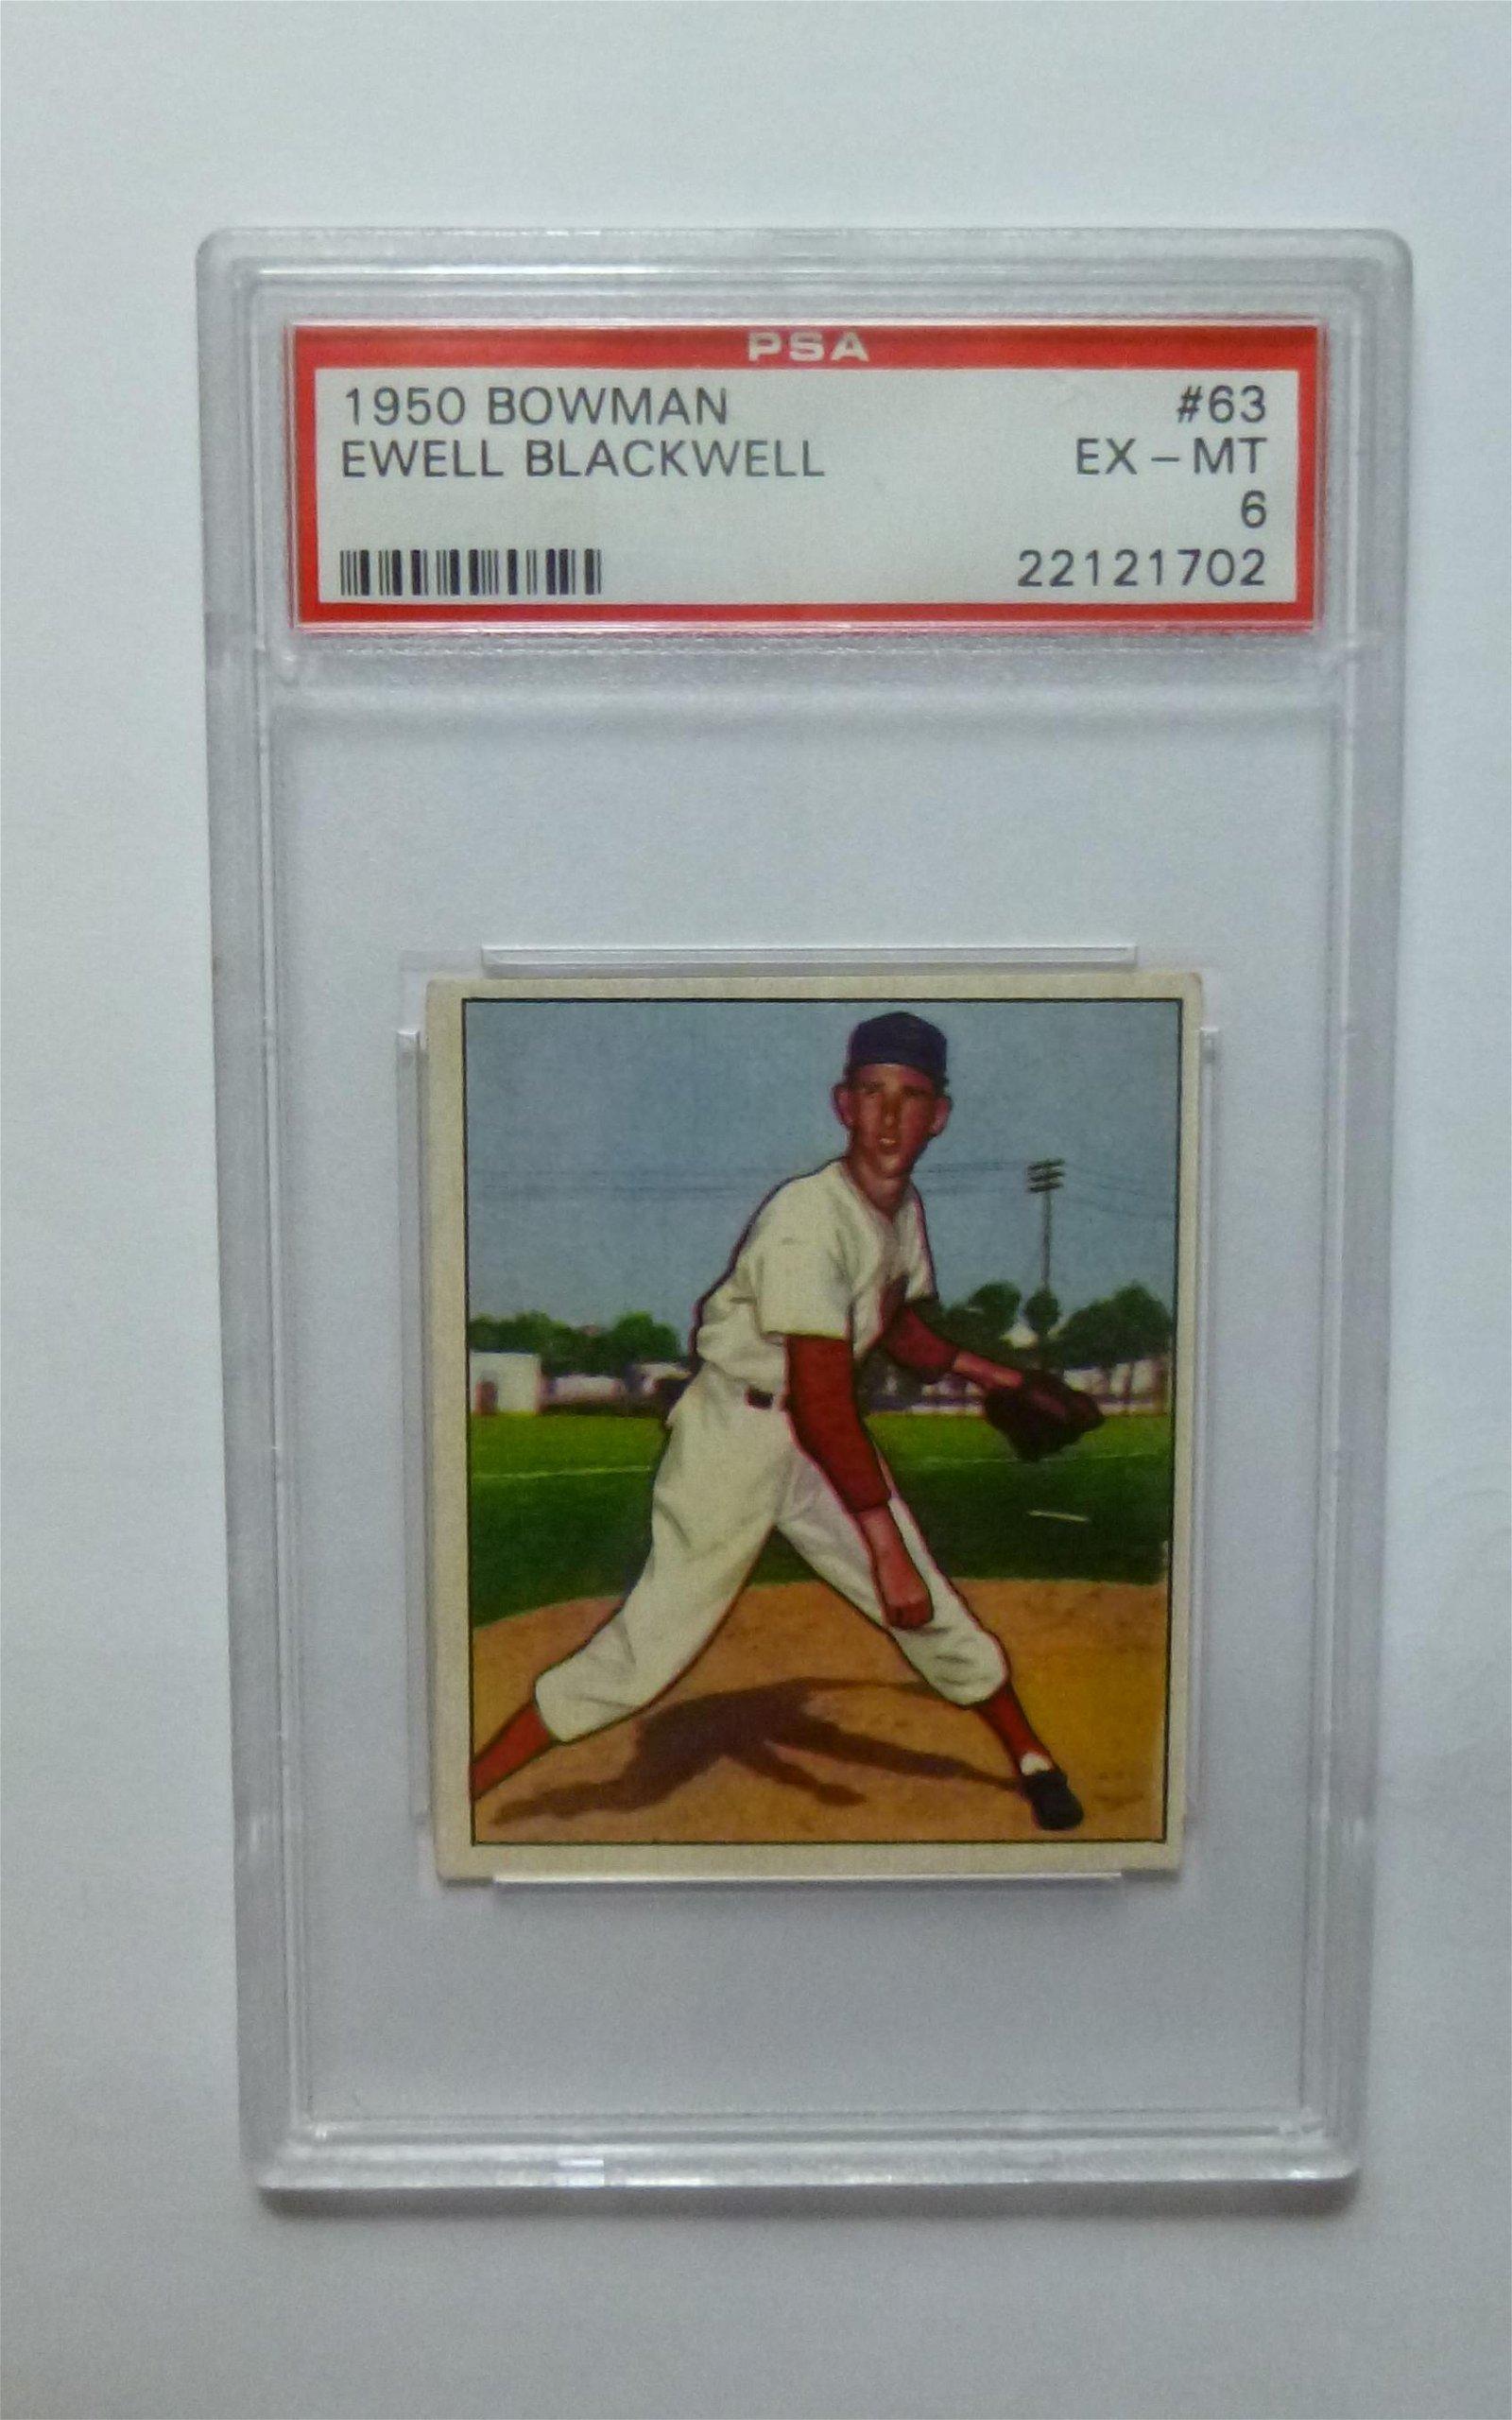 1950 Bowman #63 Ewell Blackwell PSA 6